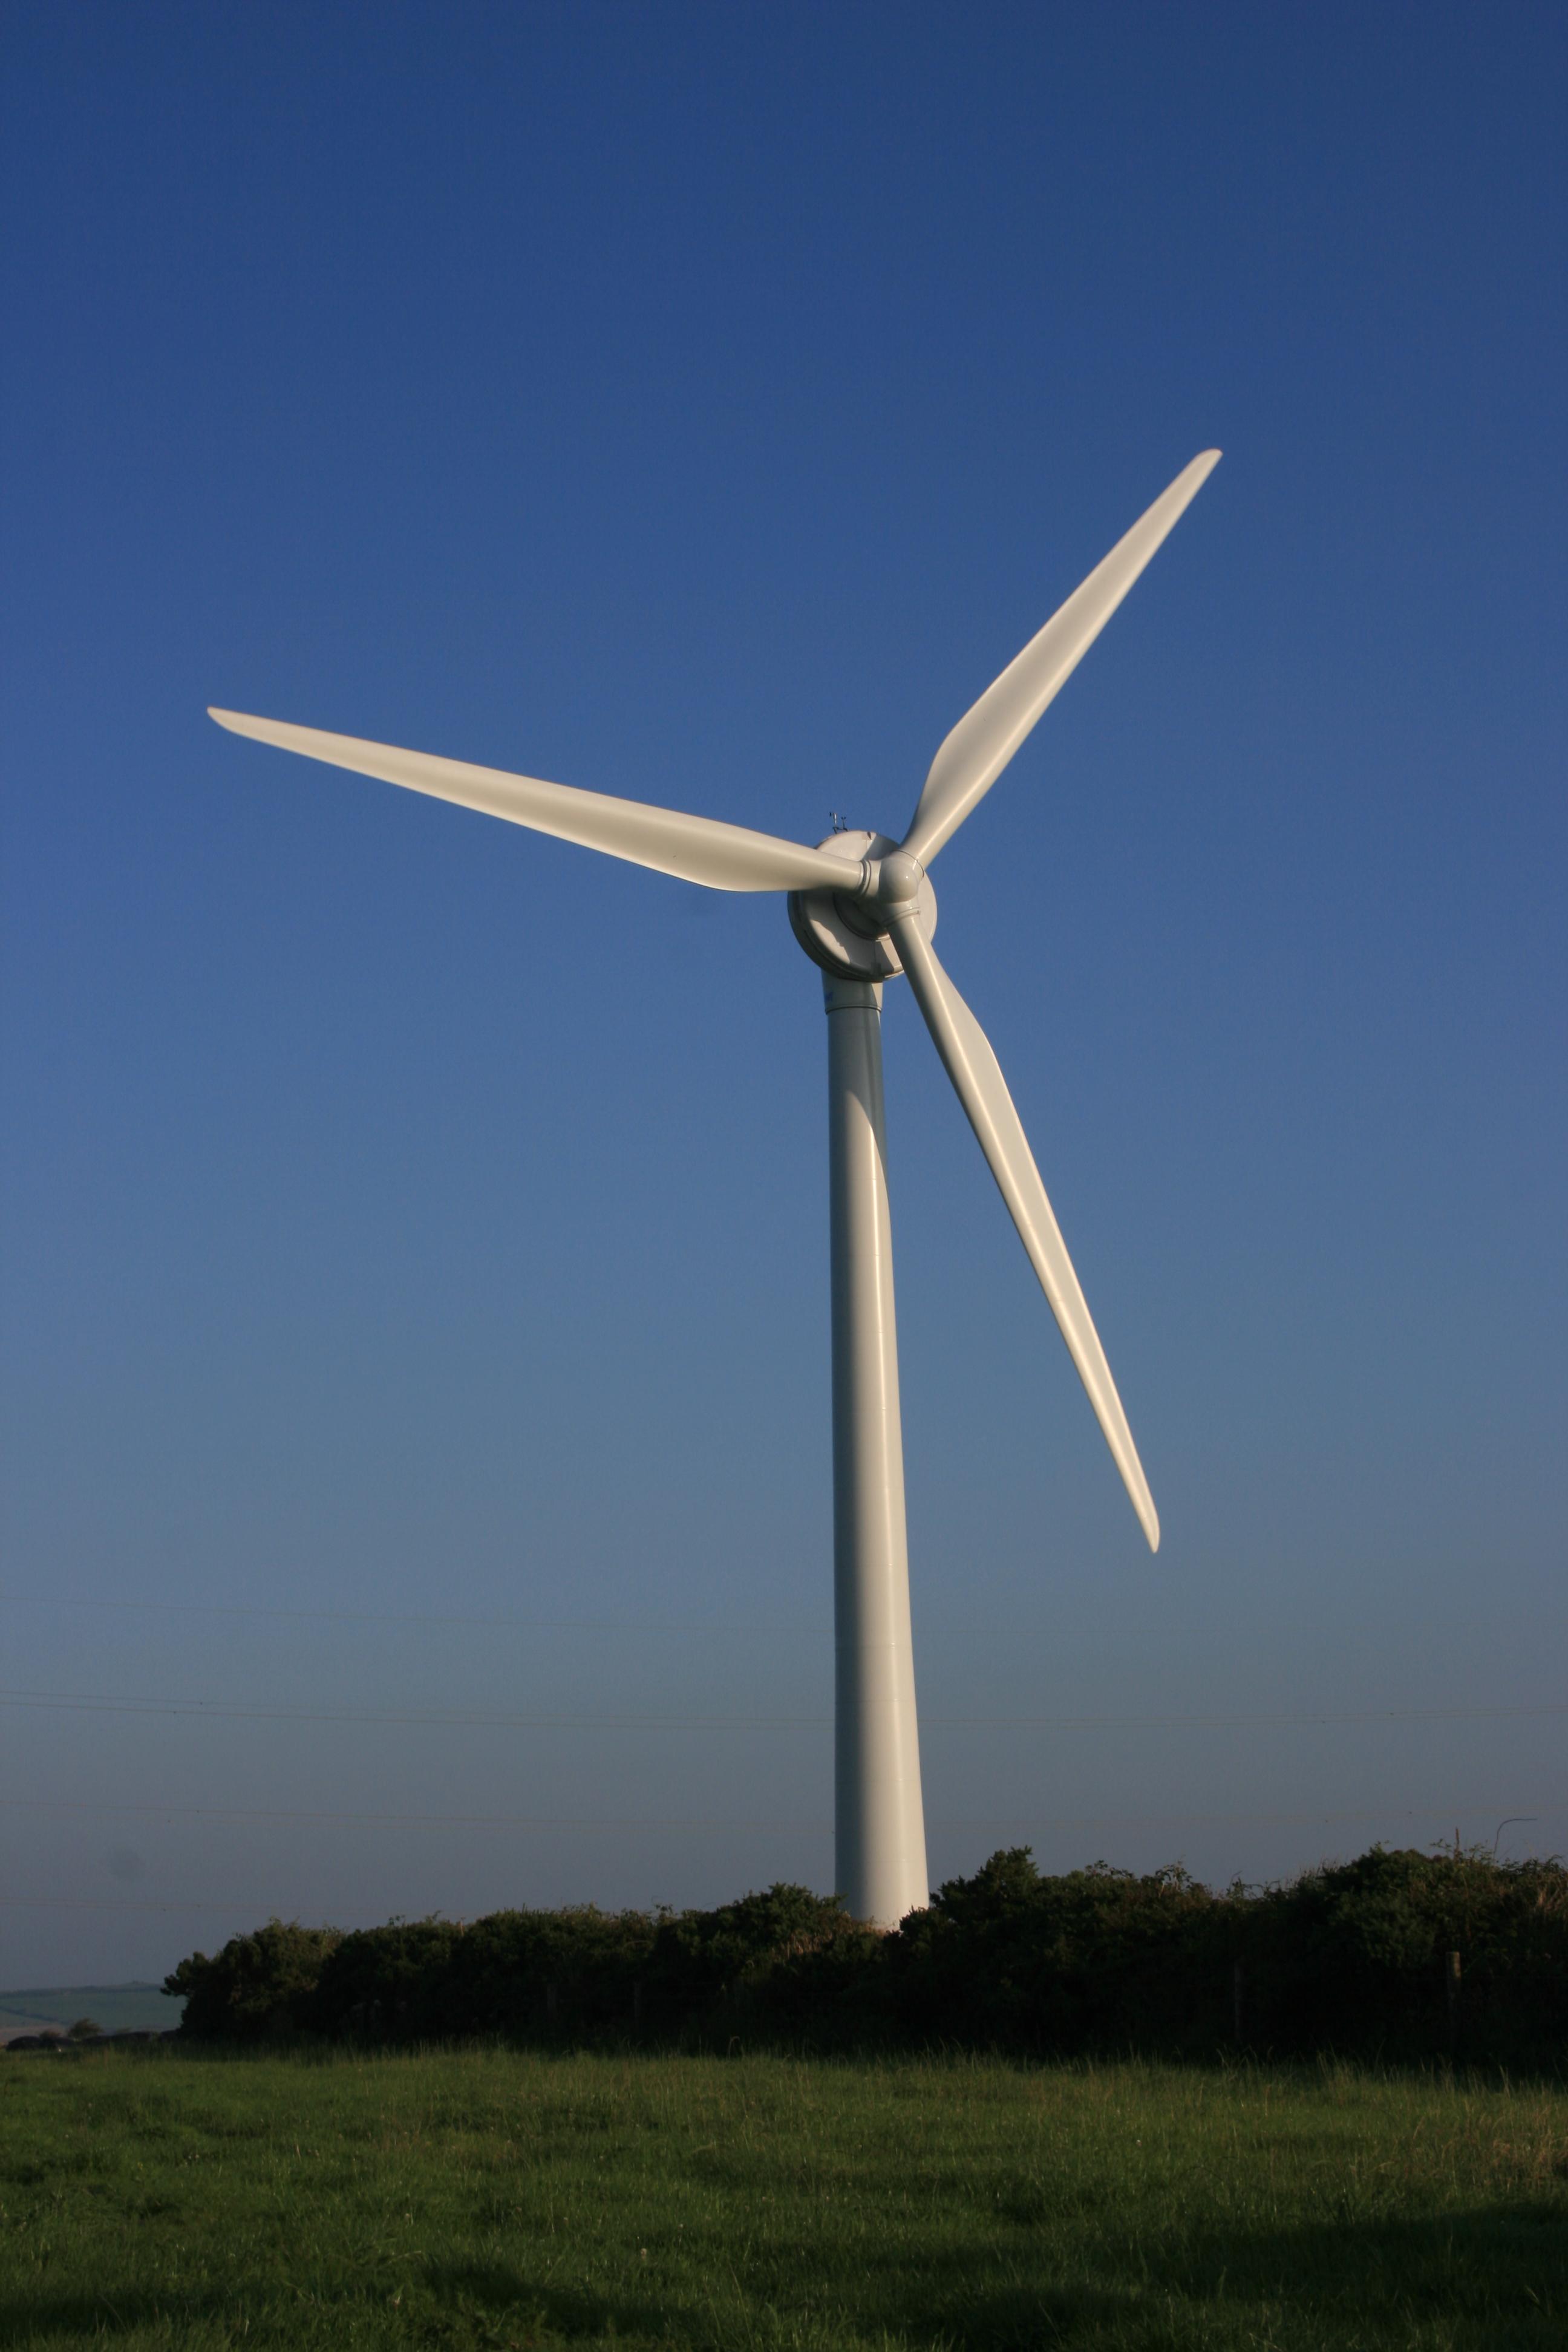 Old Whittington Wind Turbine Generator Peter Duffy Ltd